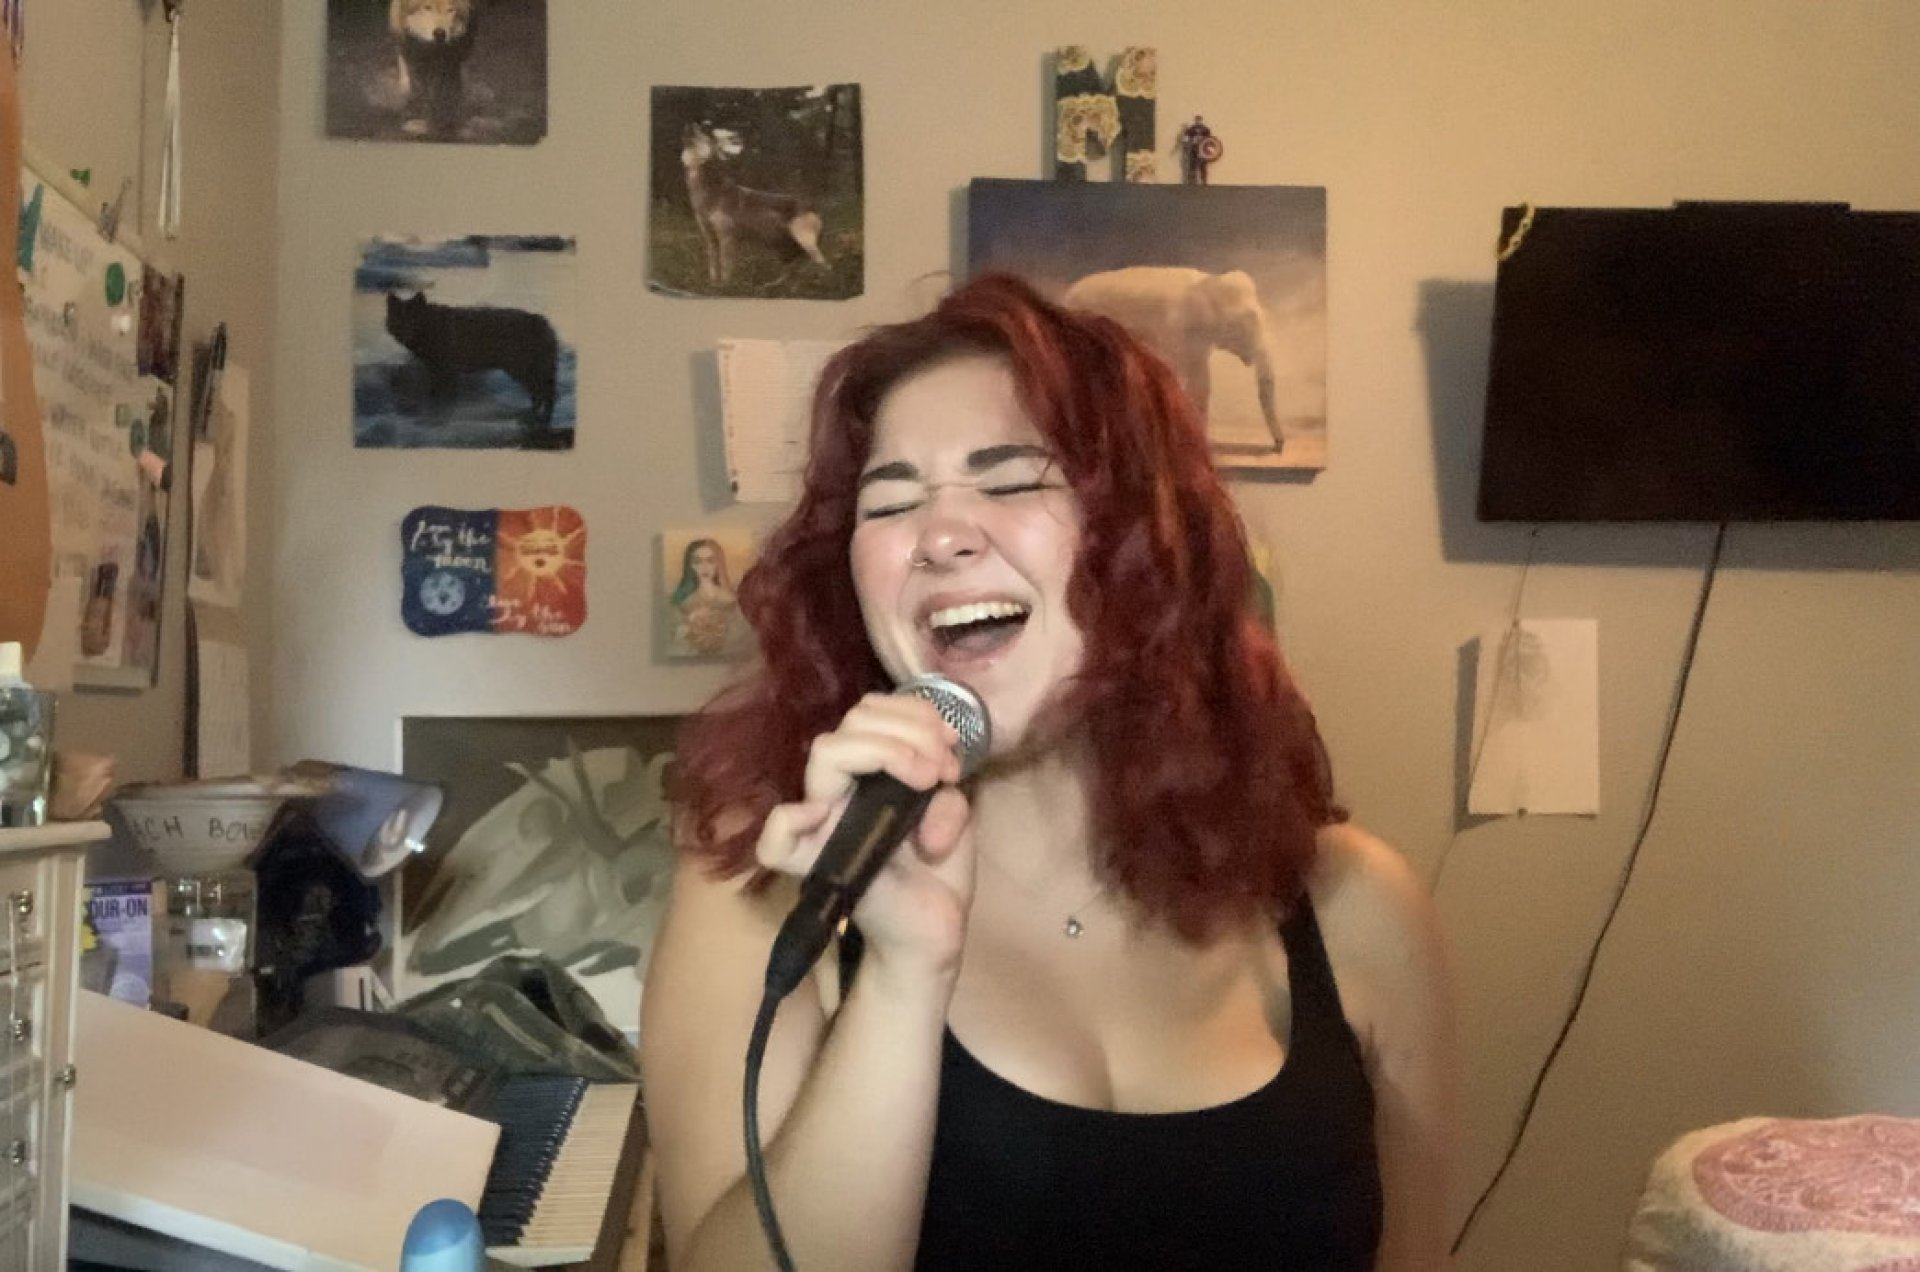 Psychology major Madelynne Avila  singing in her room. | Photo by Madelynne J. Avila